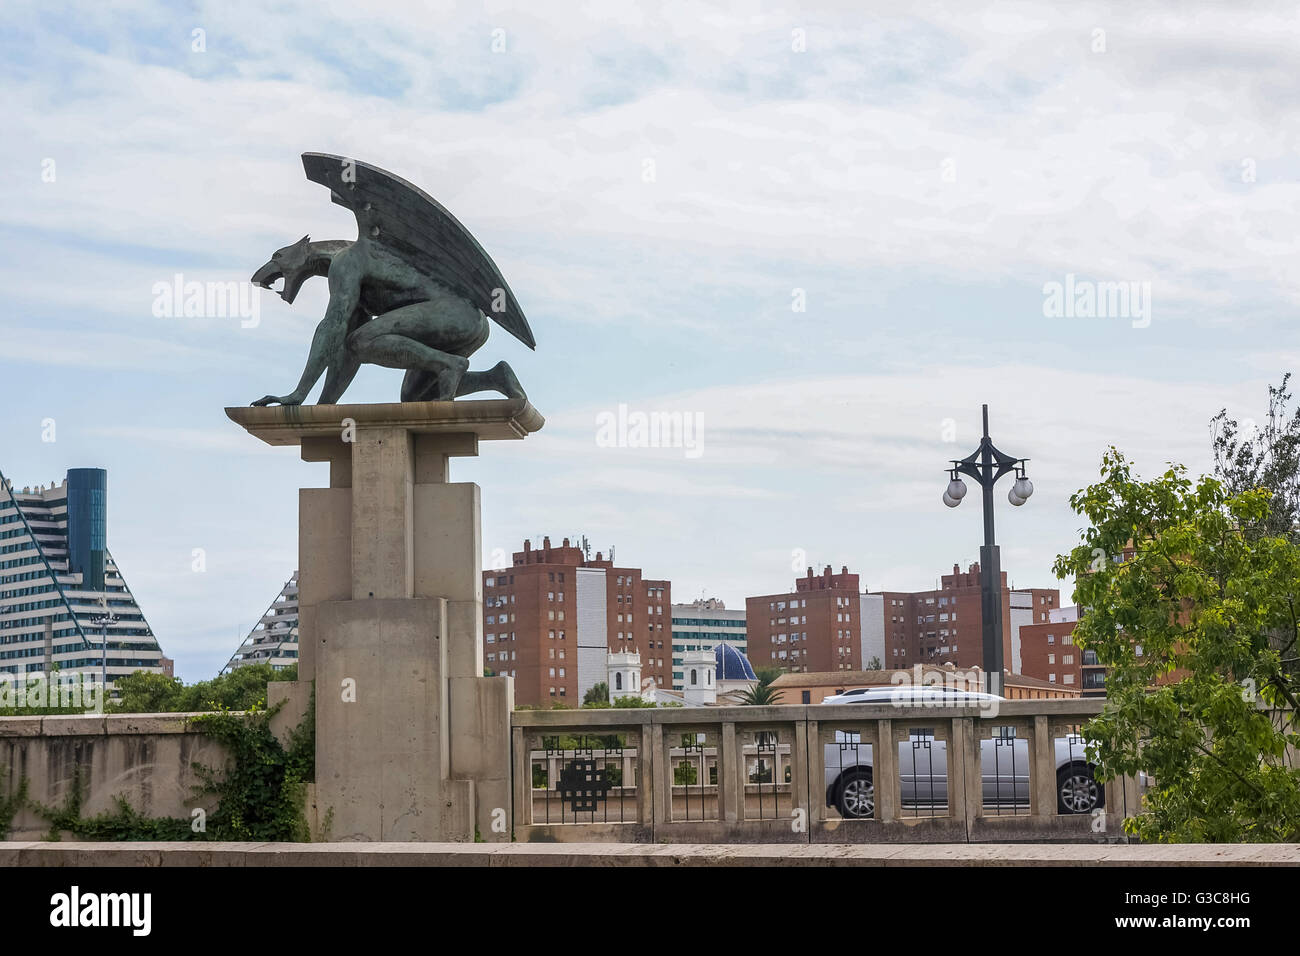 Gargoyle sculpture, Puente del Rain bridge, Valencia, Spain, Europe - Stock Image